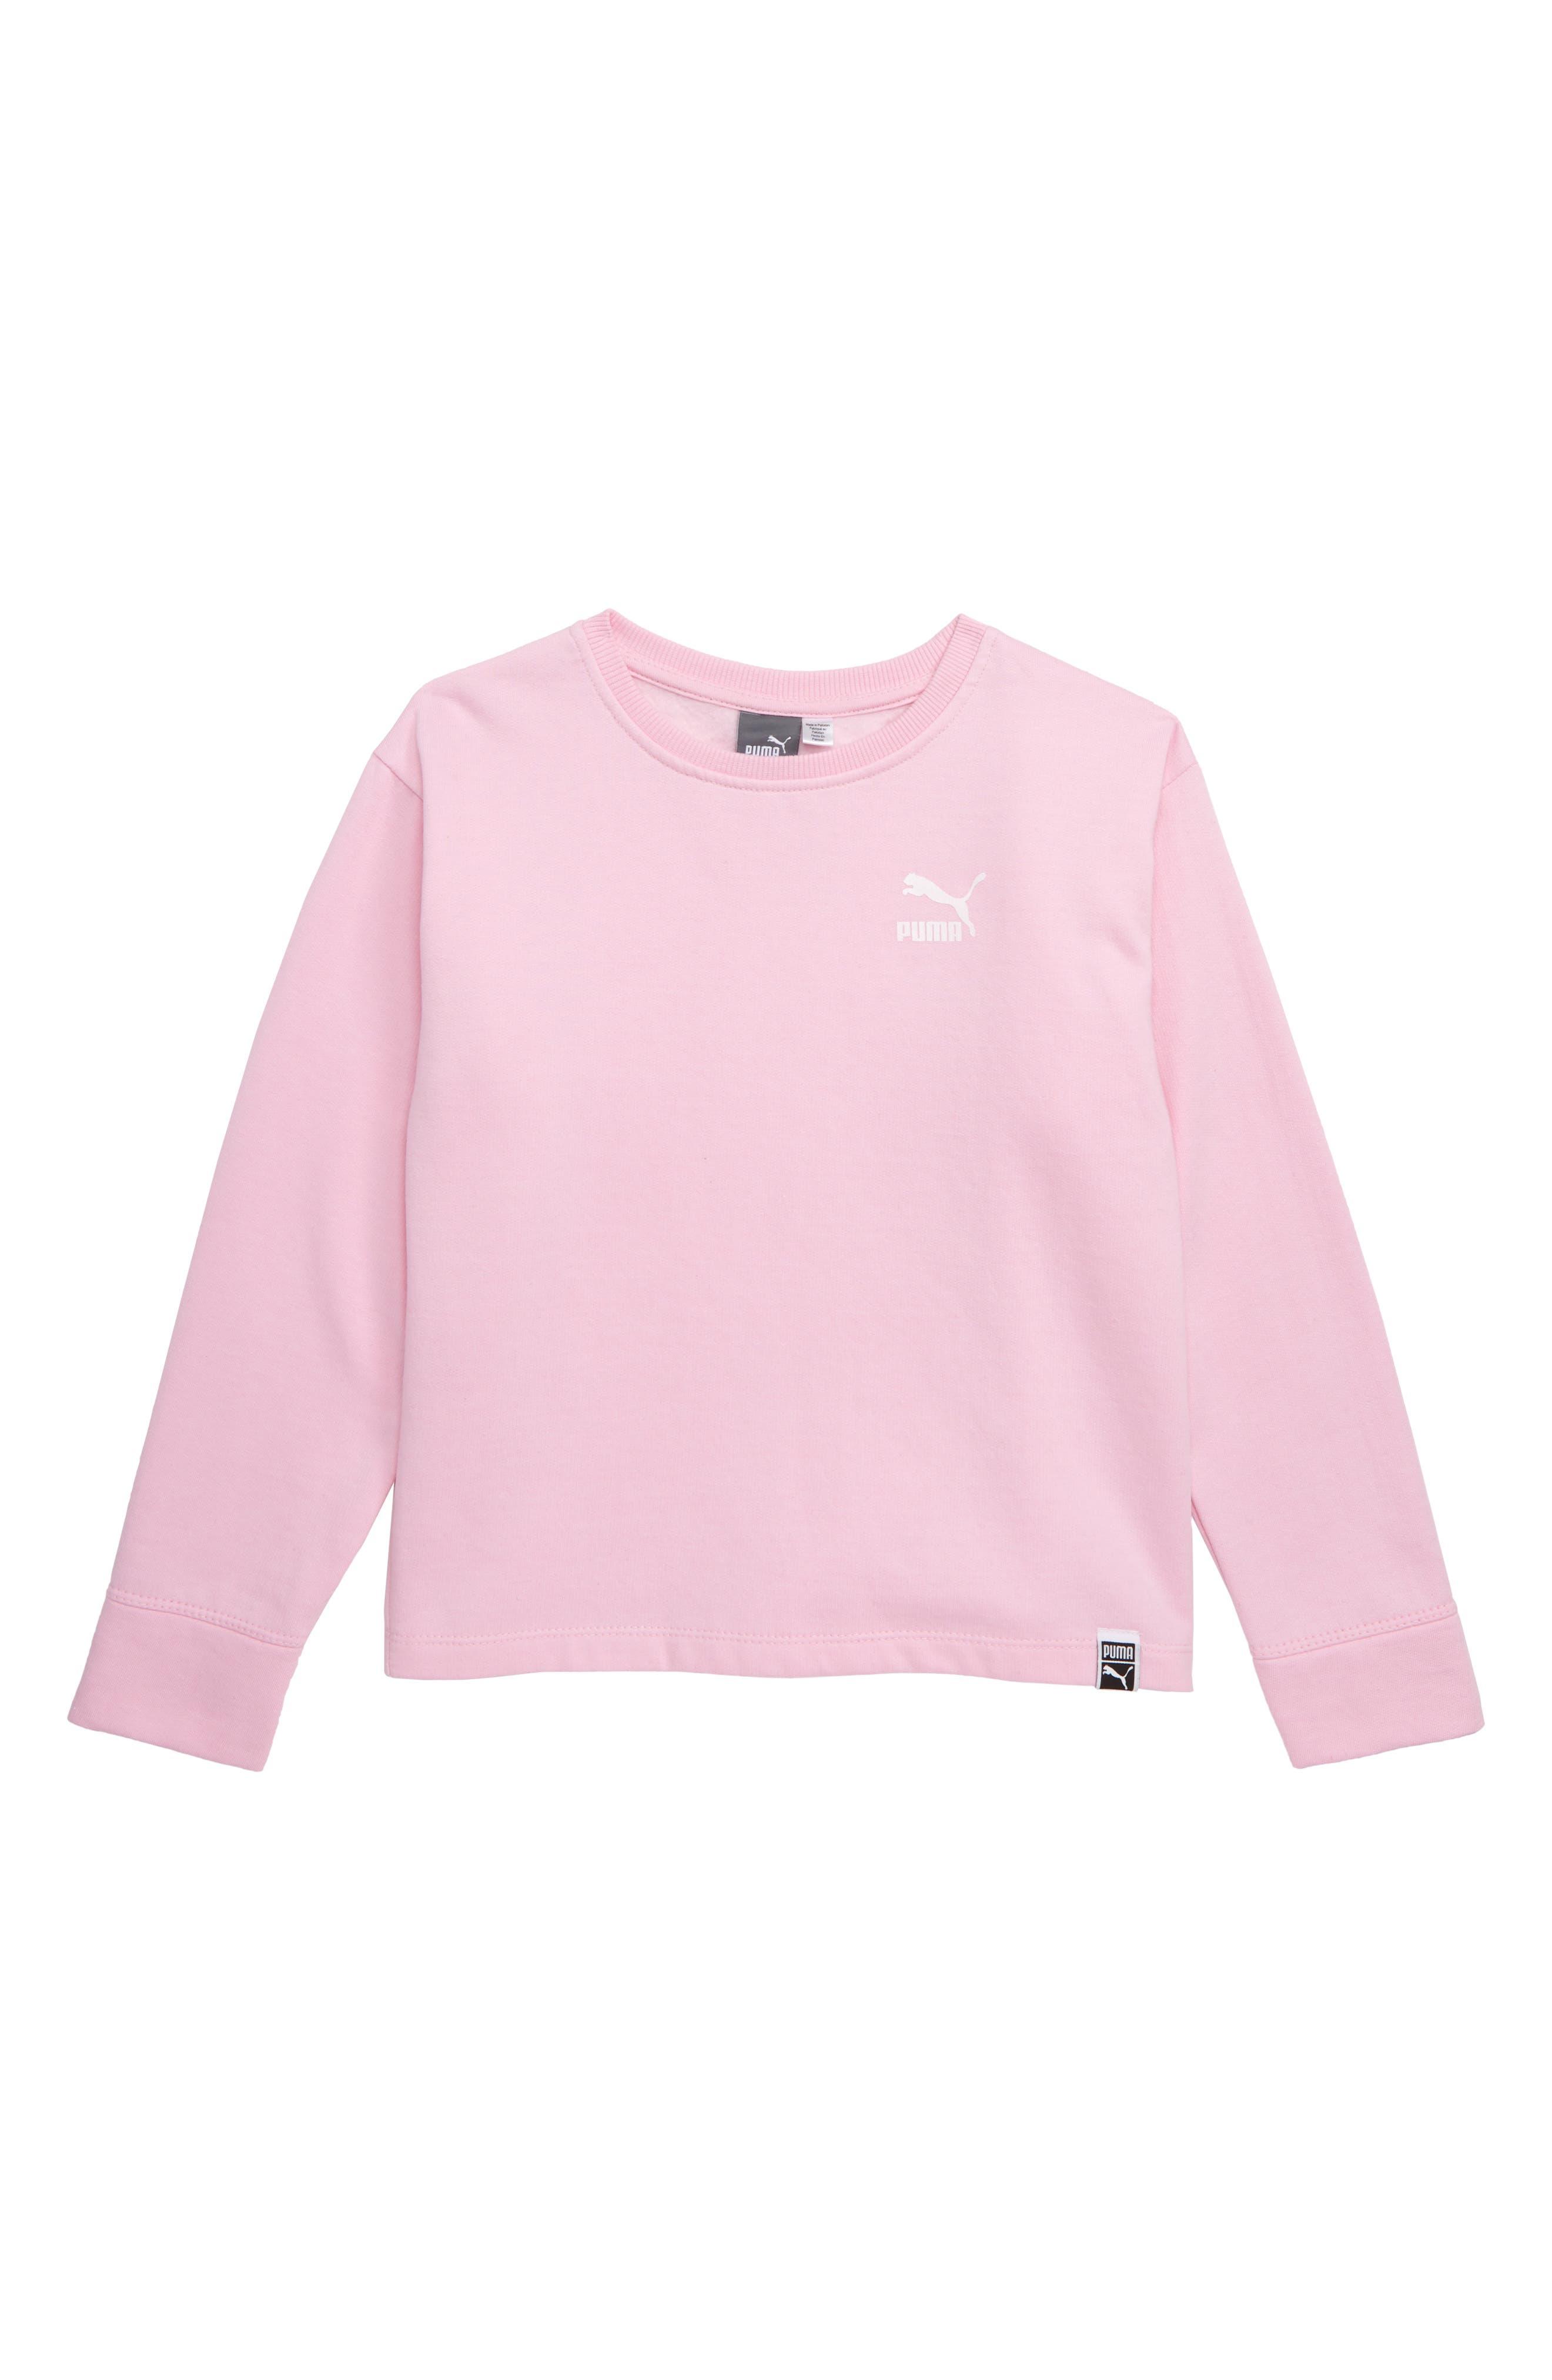 PUMA, Oversize Fleece Pullover, Main thumbnail 1, color, 650